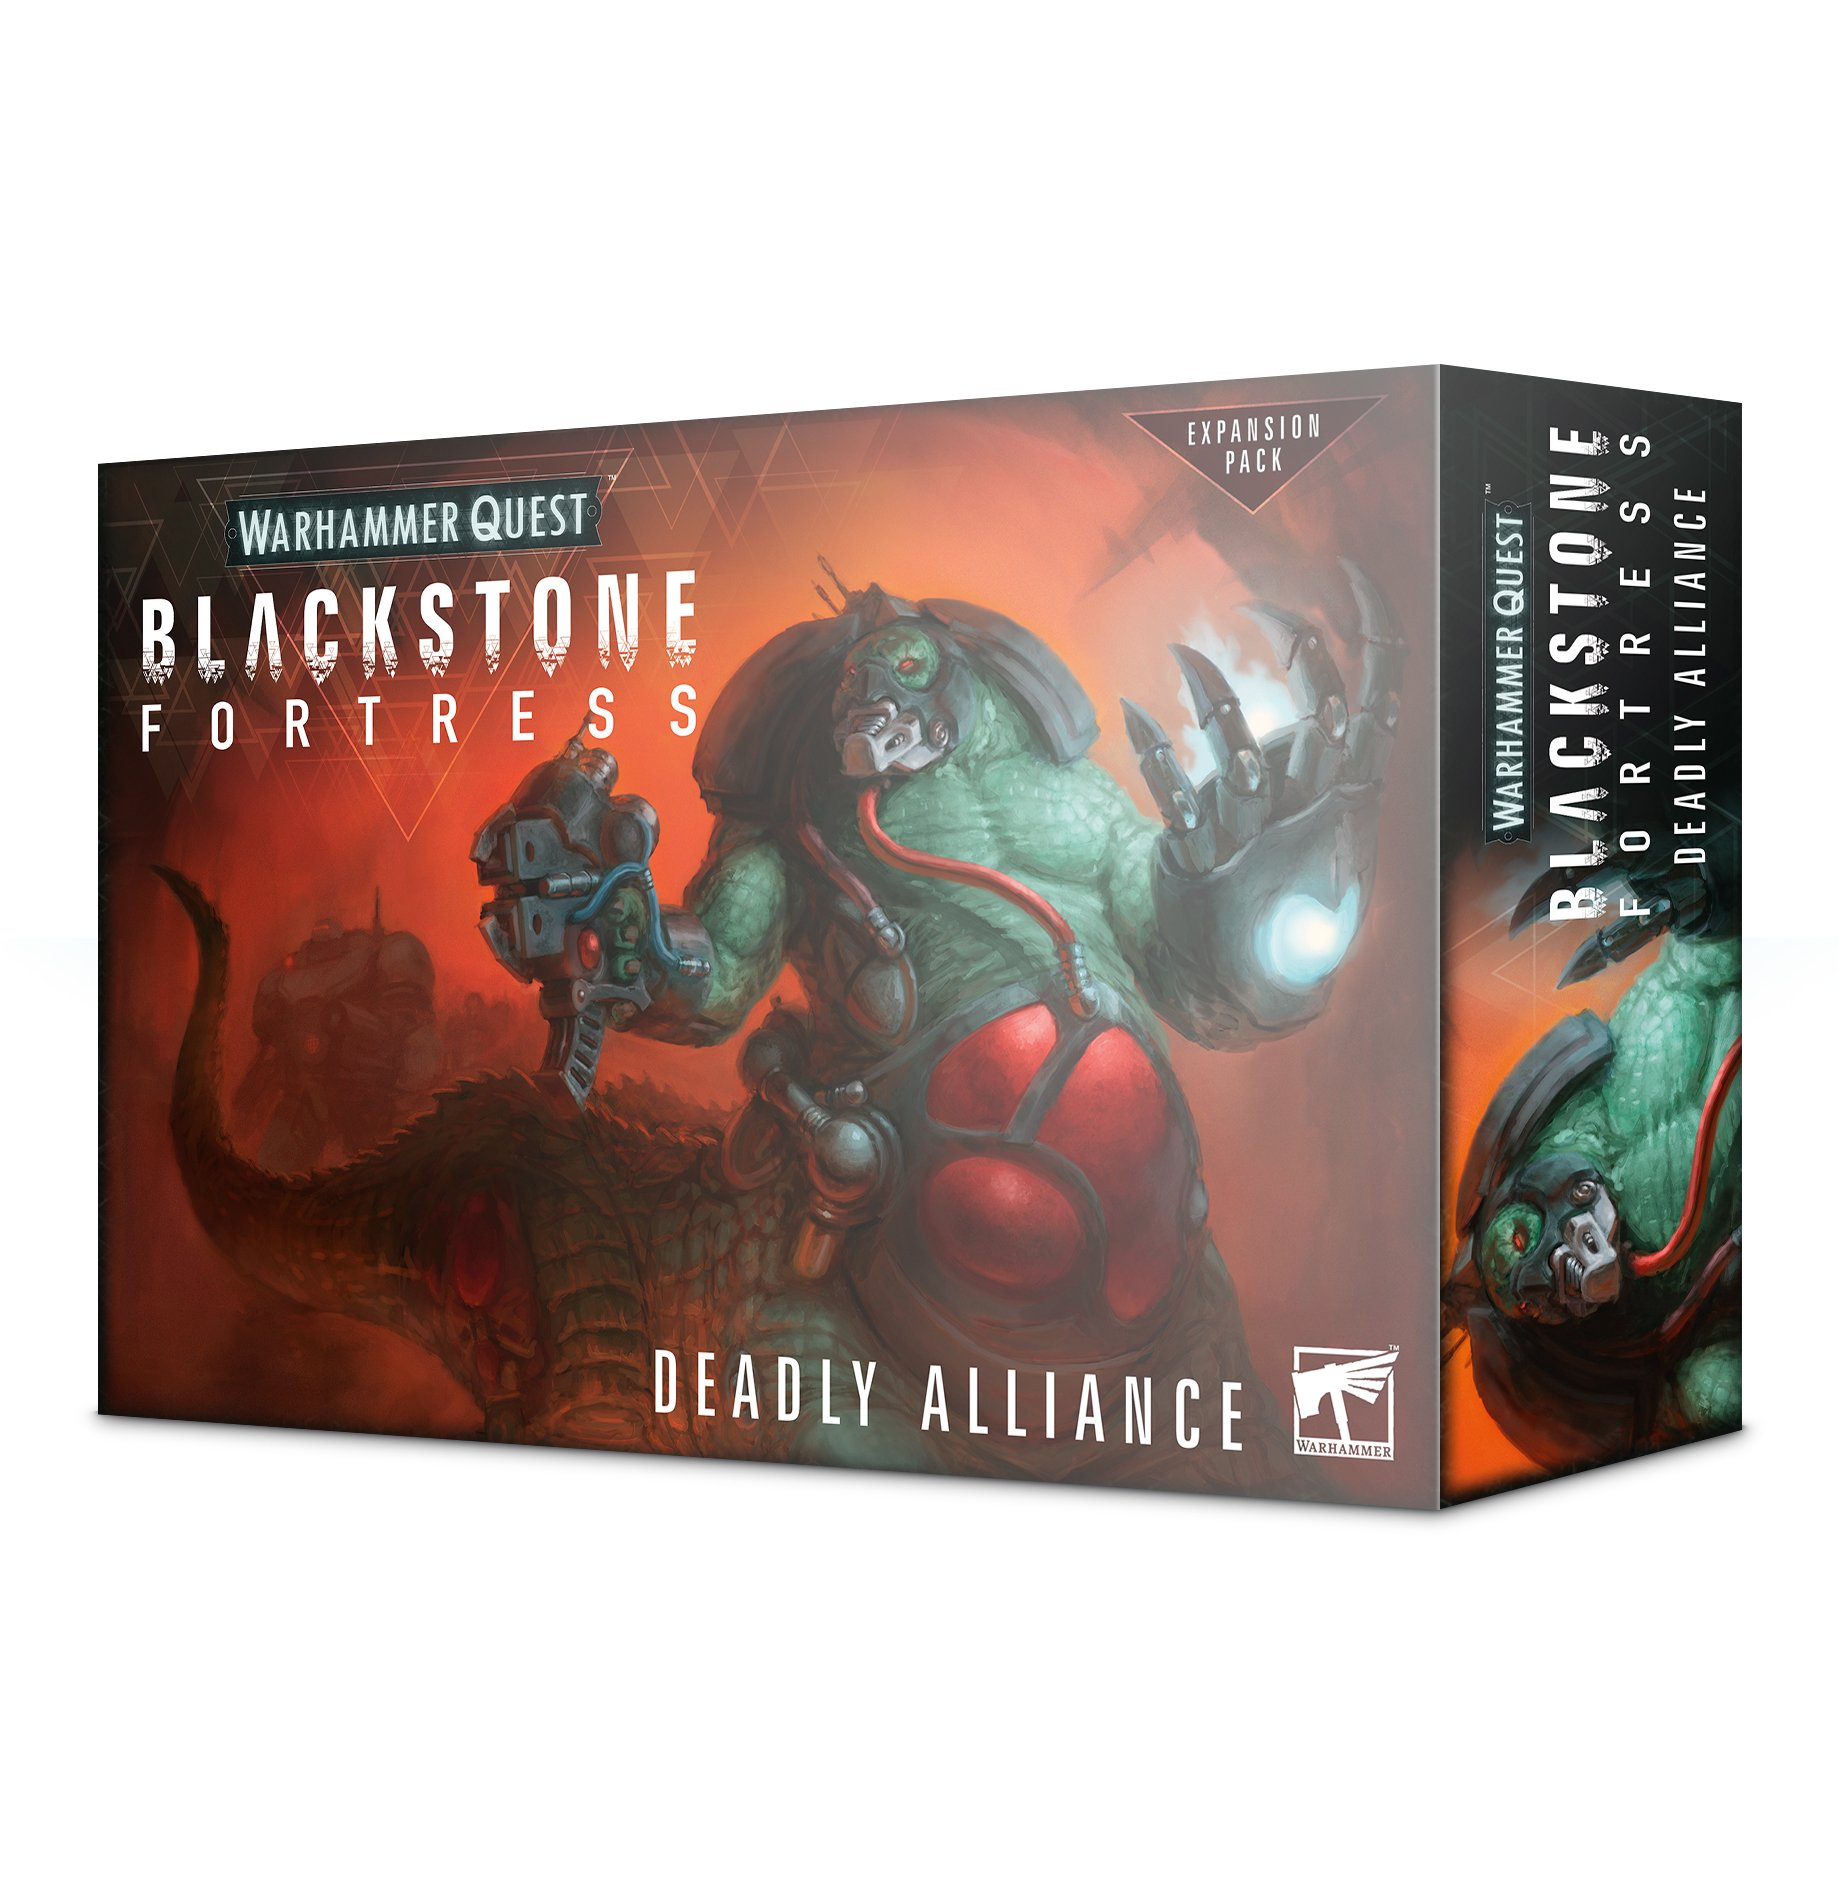 Deadly Alliance, Blackstone Fortress